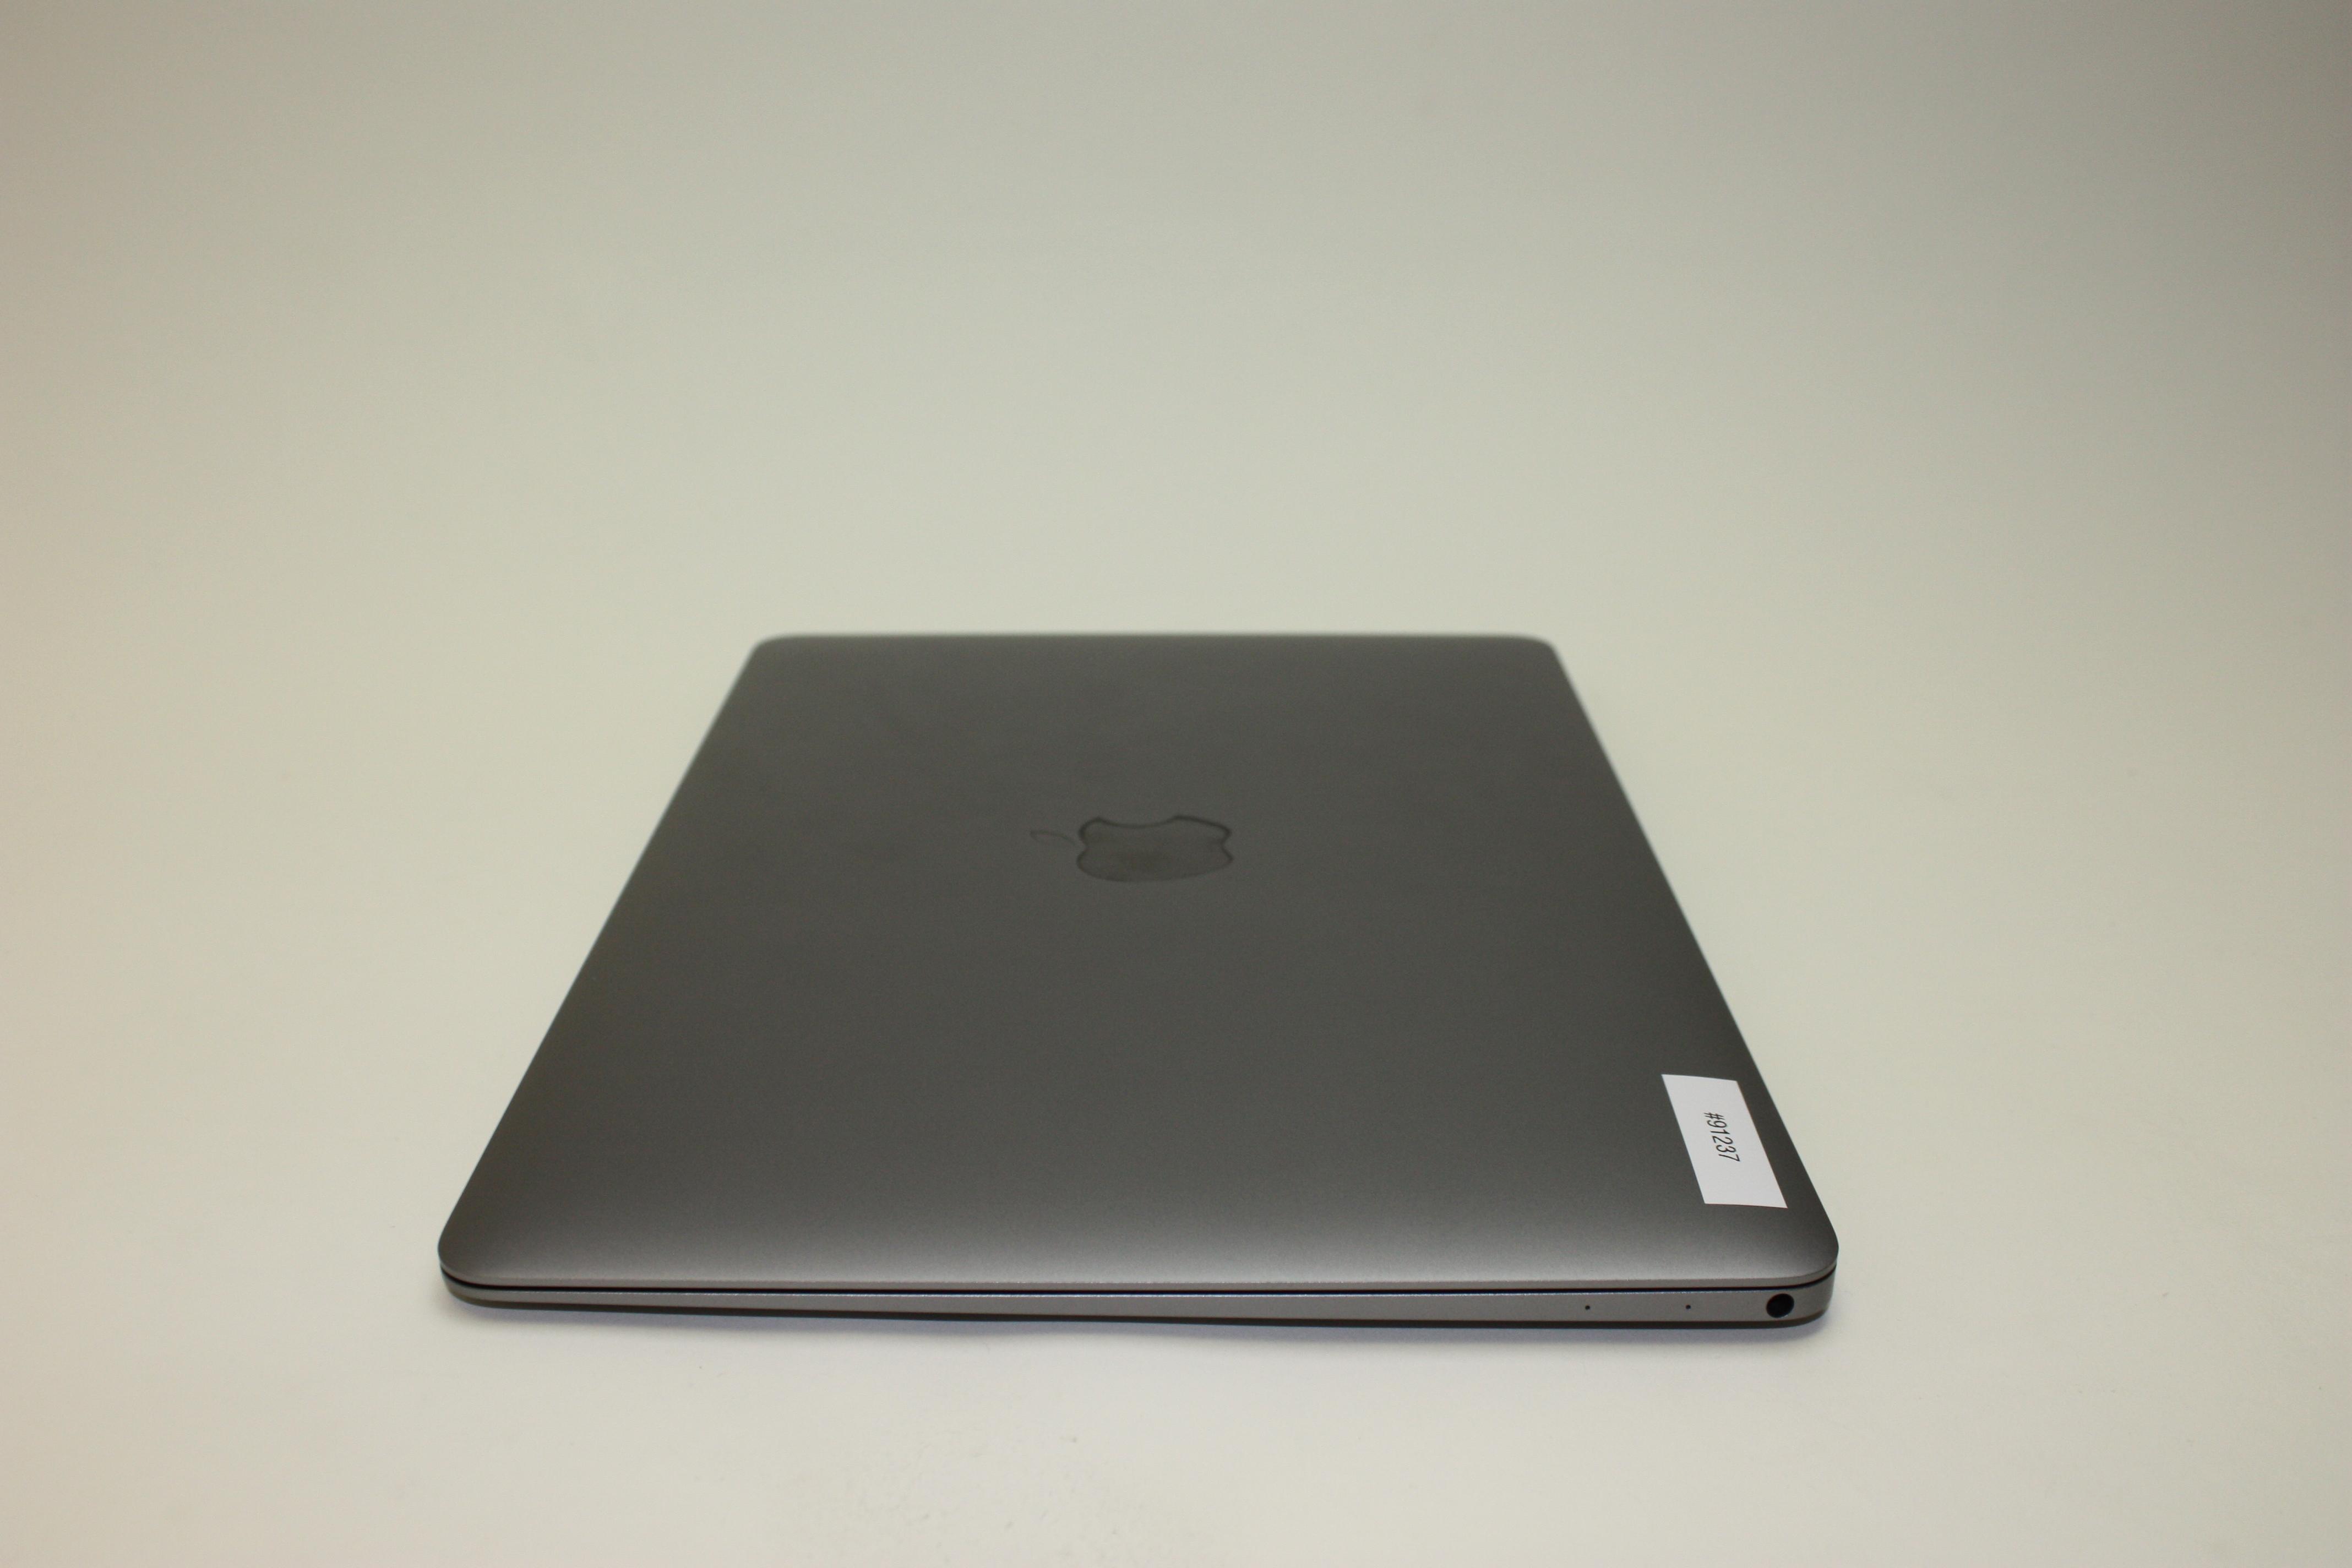 MacBook 12-inch Retina, 1.3 GHz Core M (M-5Y71), 8 GB 1867 MHz DDR3, 256 GB Flash Storage, image 6